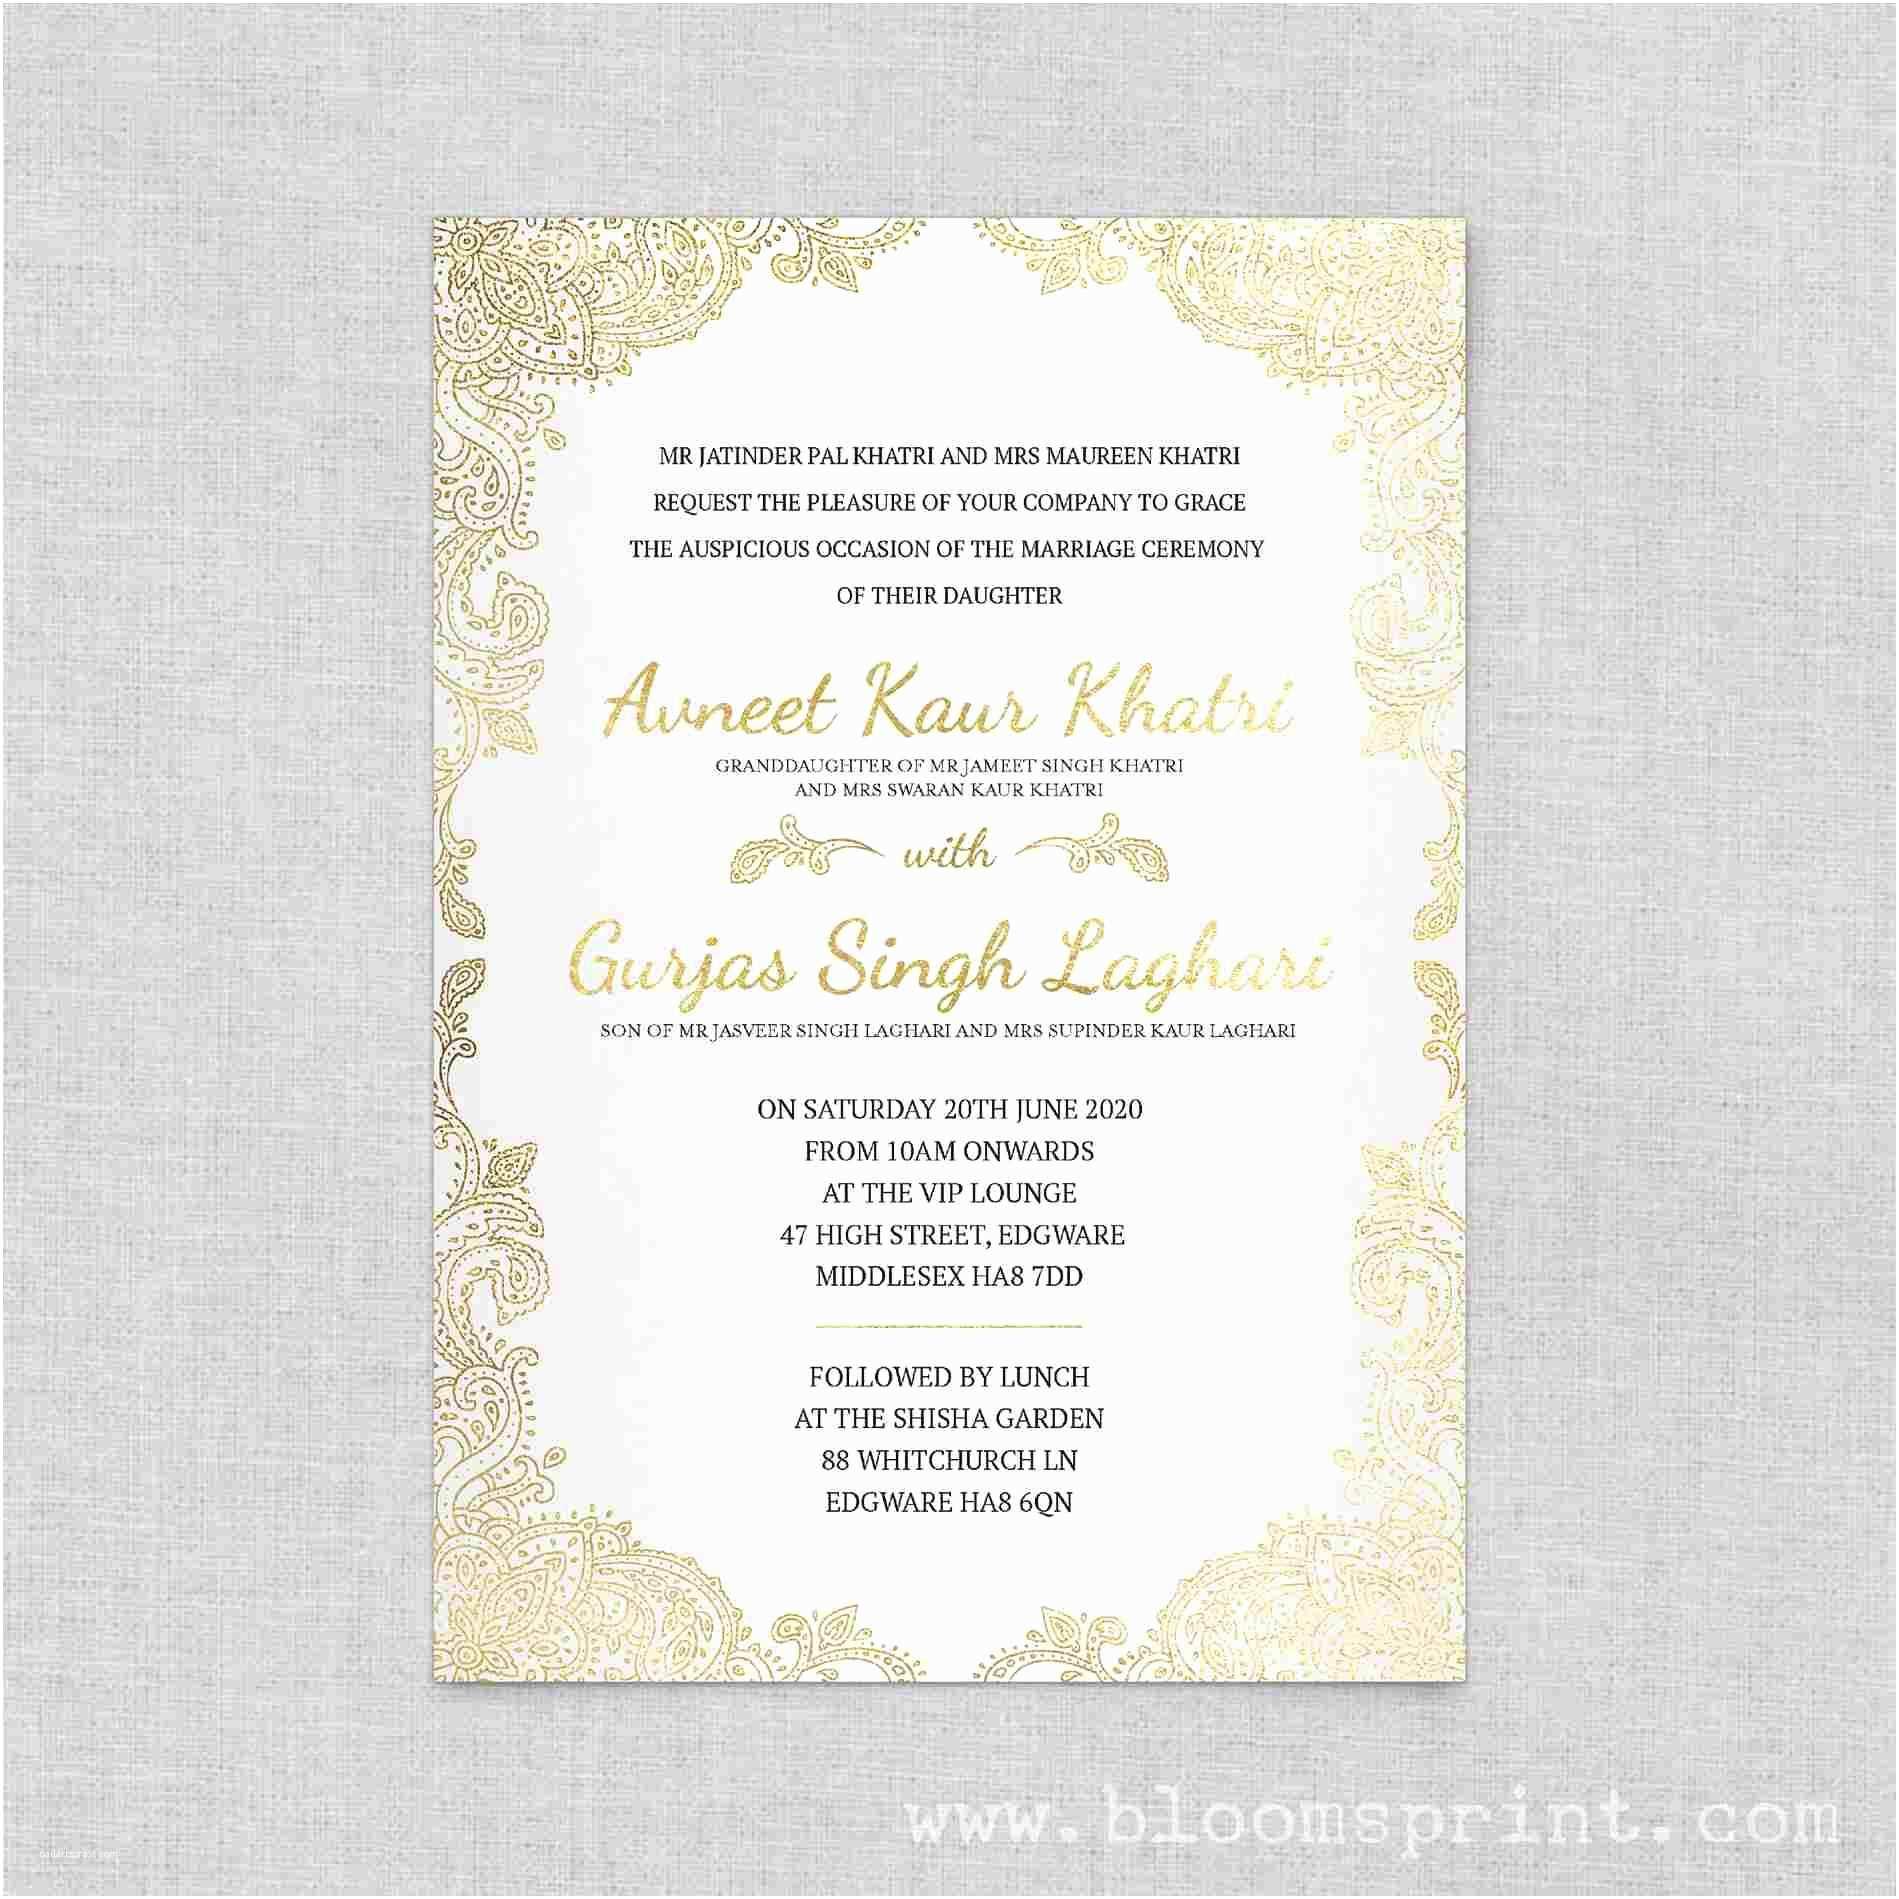 Best Wedding Invitation Websites Freebie Wedding Invitations Online Europe Boarding Pass